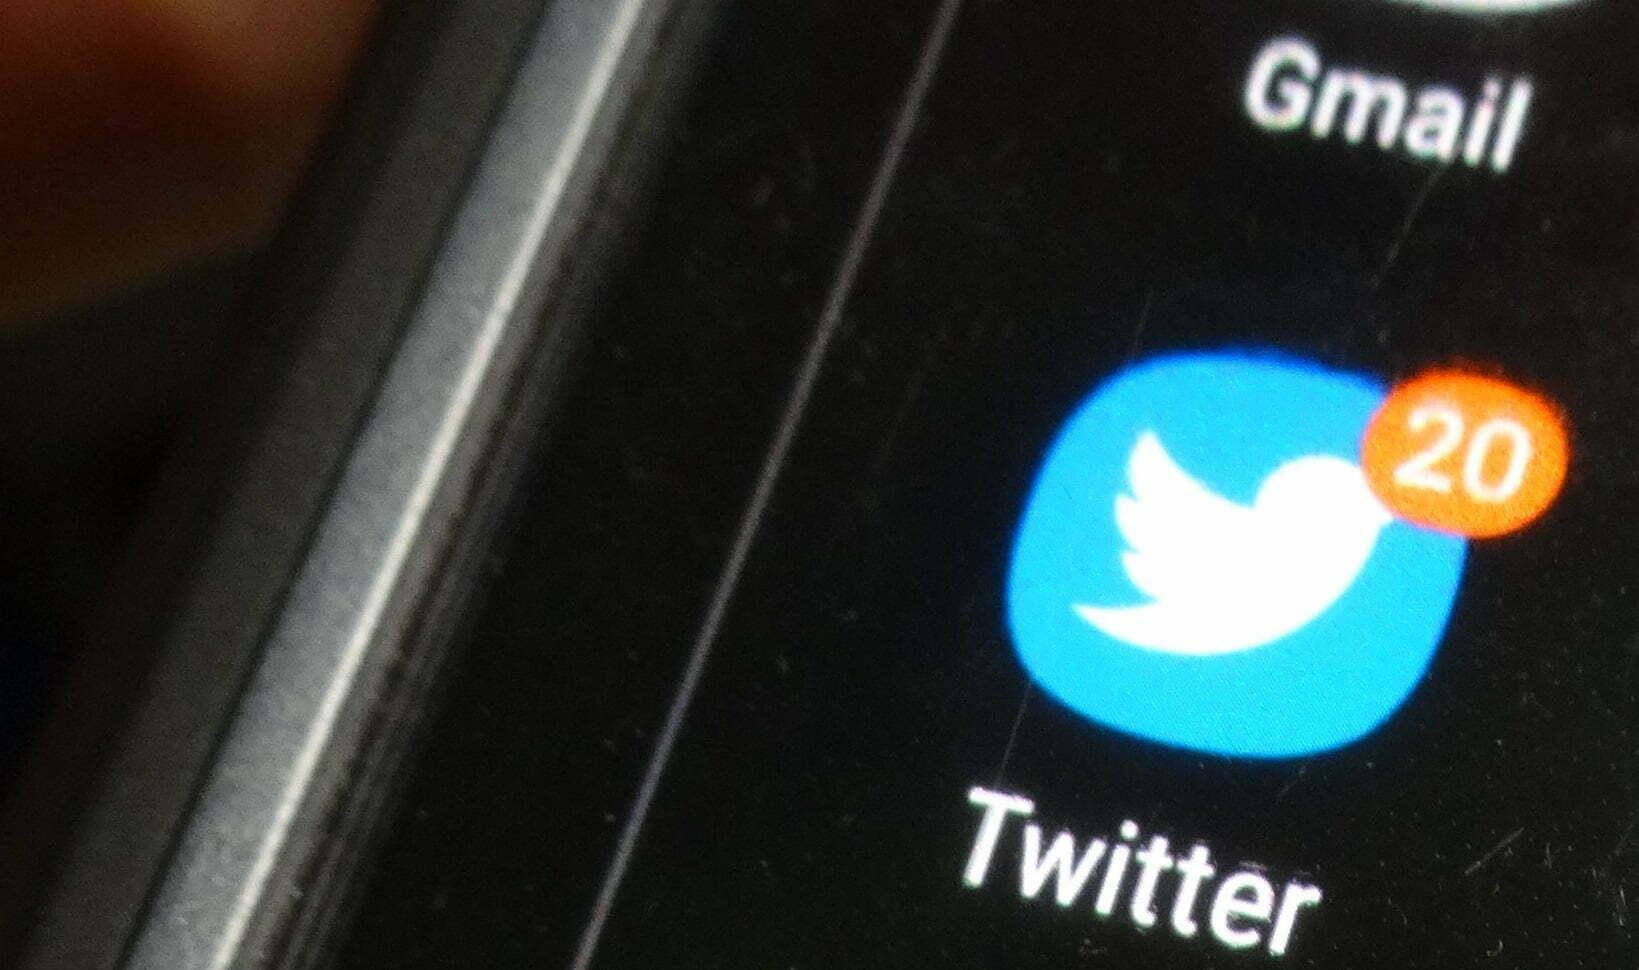 Twitter testing longer tweets